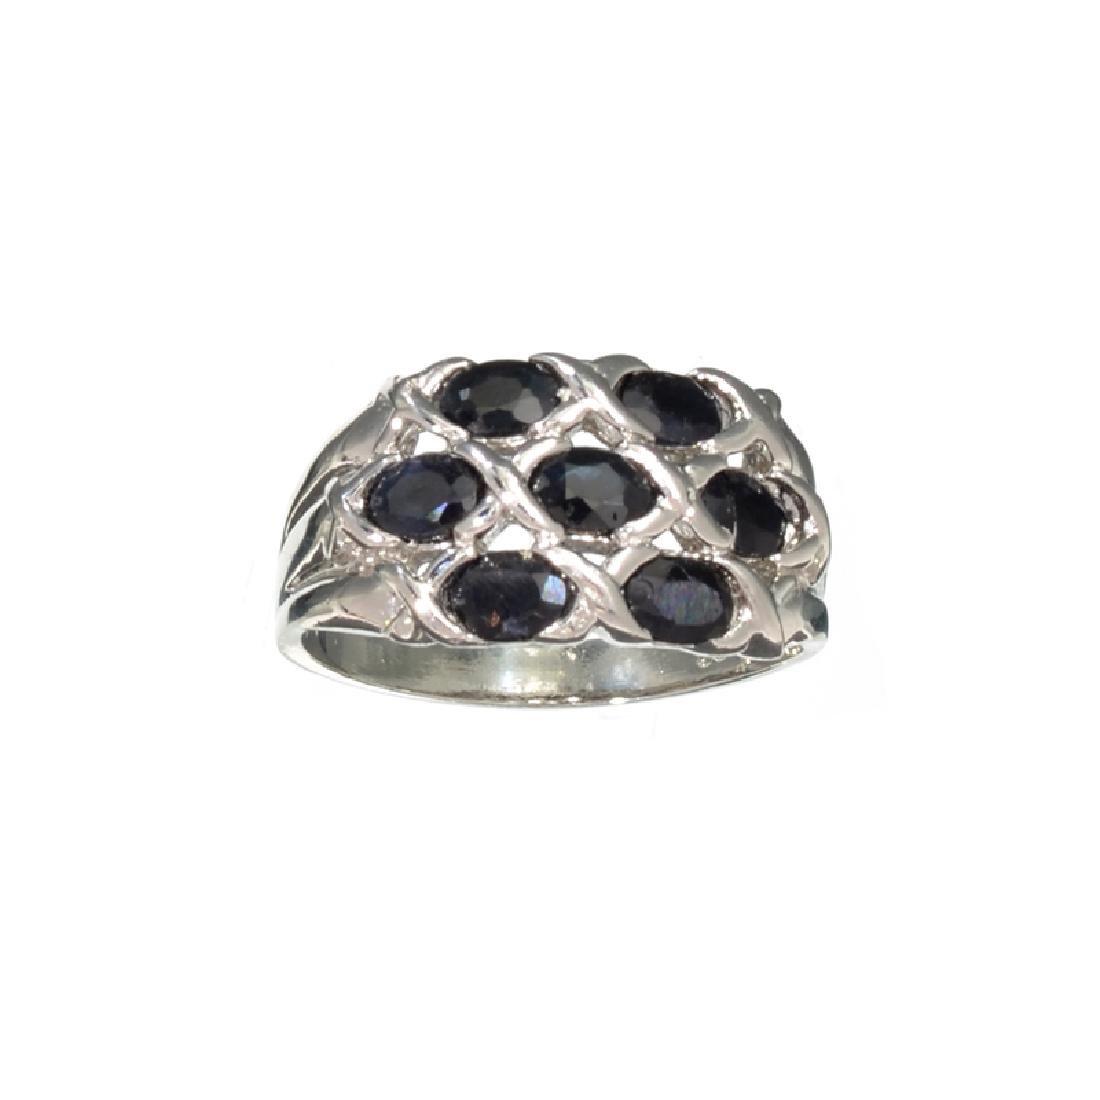 APP: 0.7k Fine Jewelry 1.50CT Oval Cut Blue Sapphire